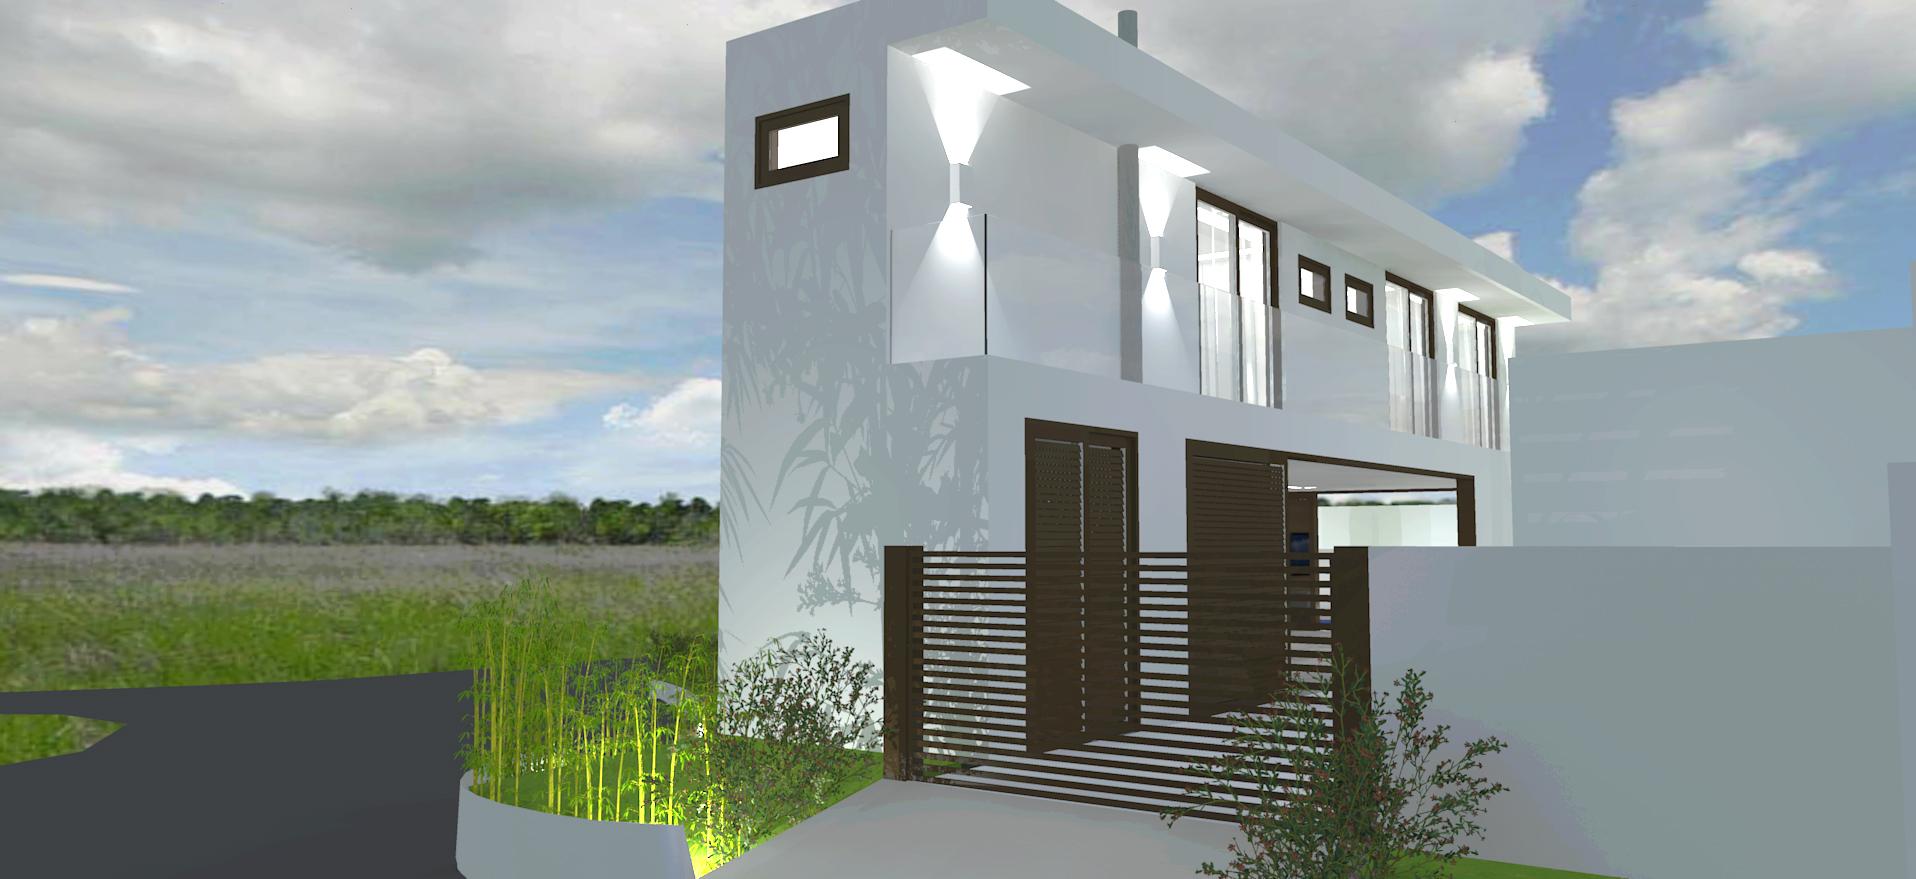 midrie-arquitetura-Residencia1_v7.jpg